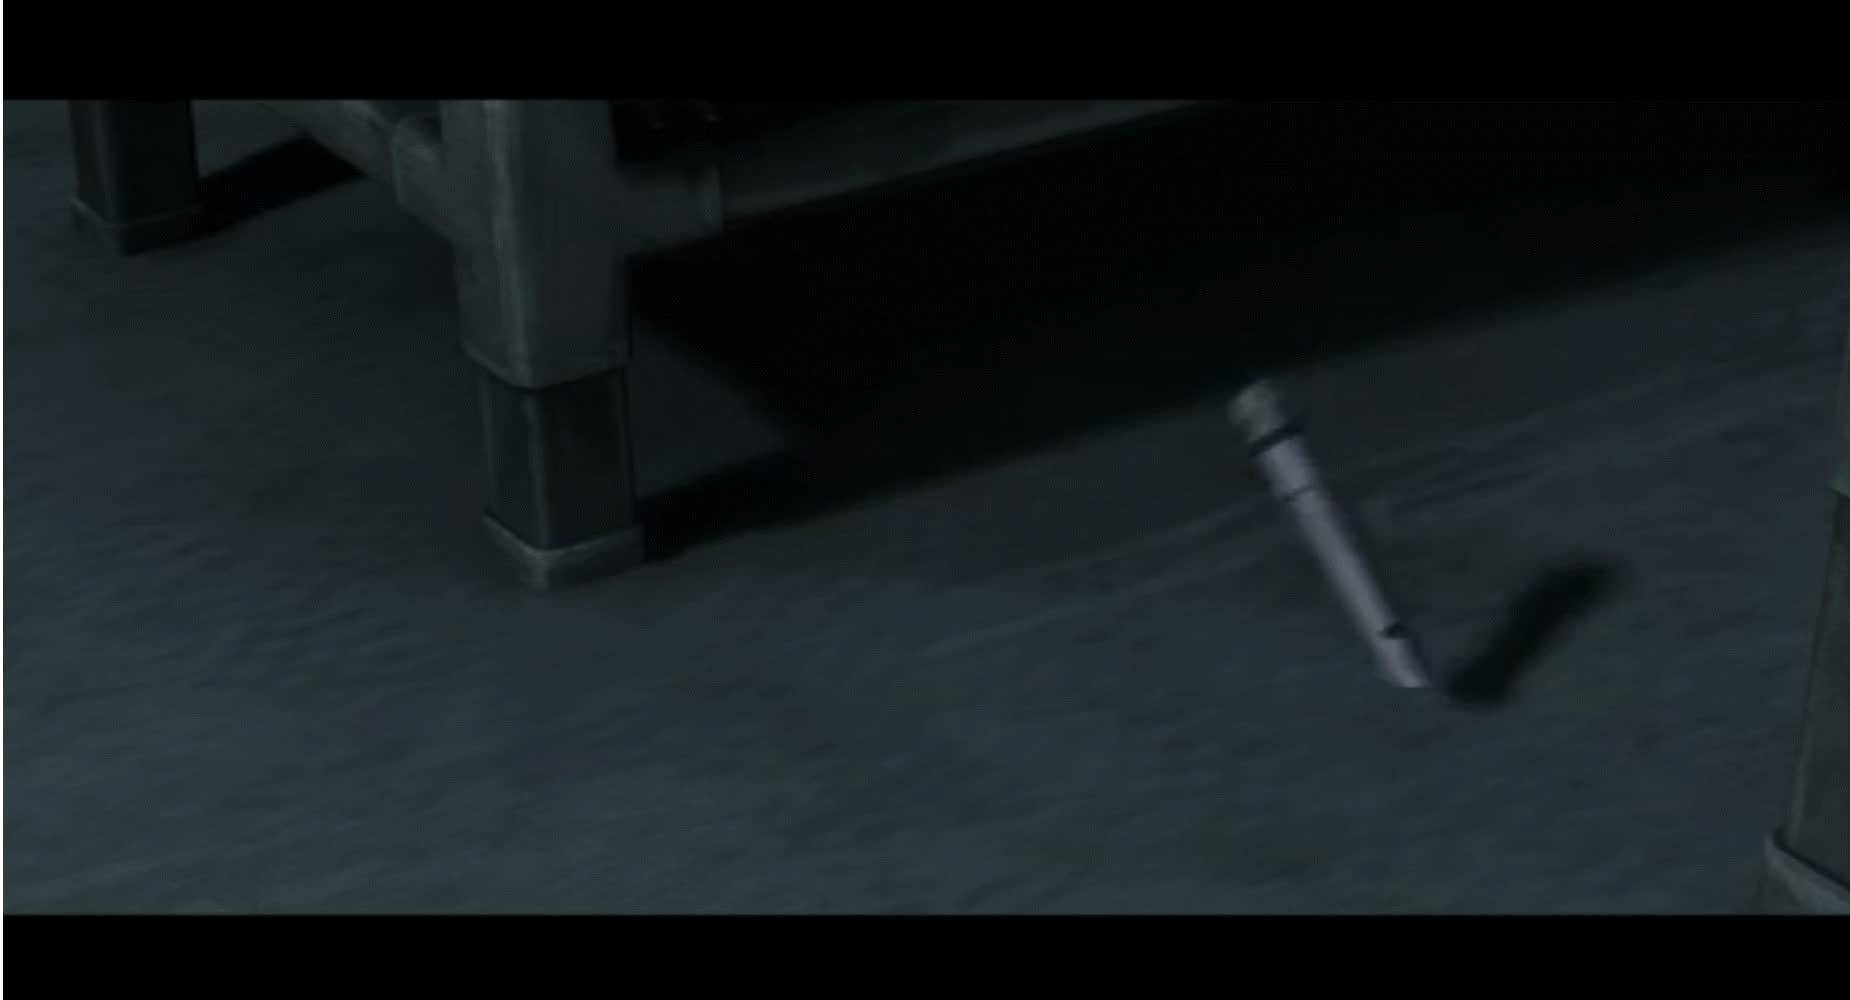 3 - [Force] Calls her lightsaber forth GIFs